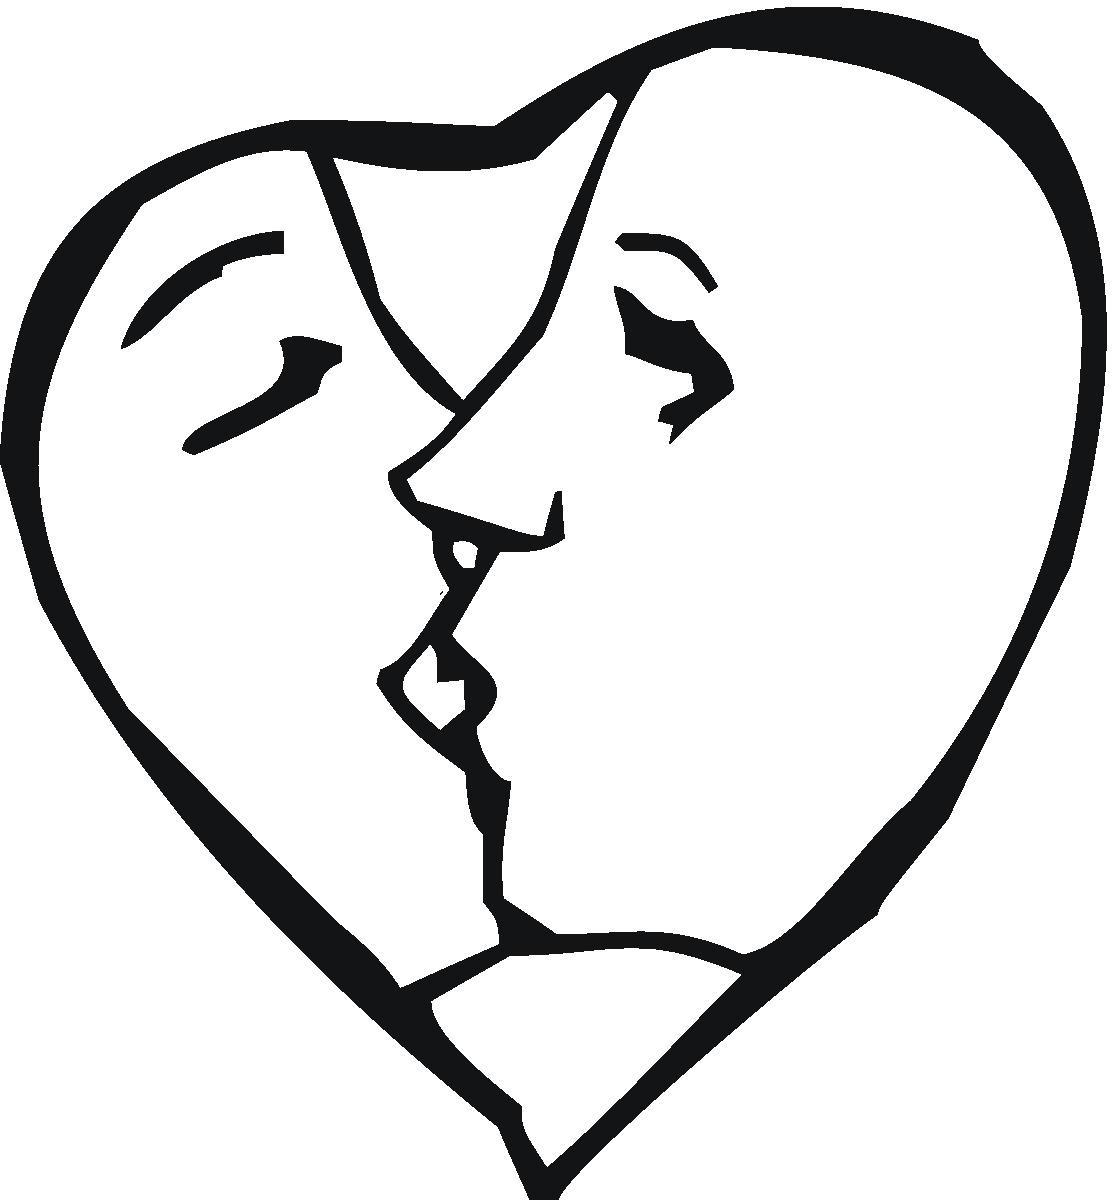 Kiss Clipart Black And White